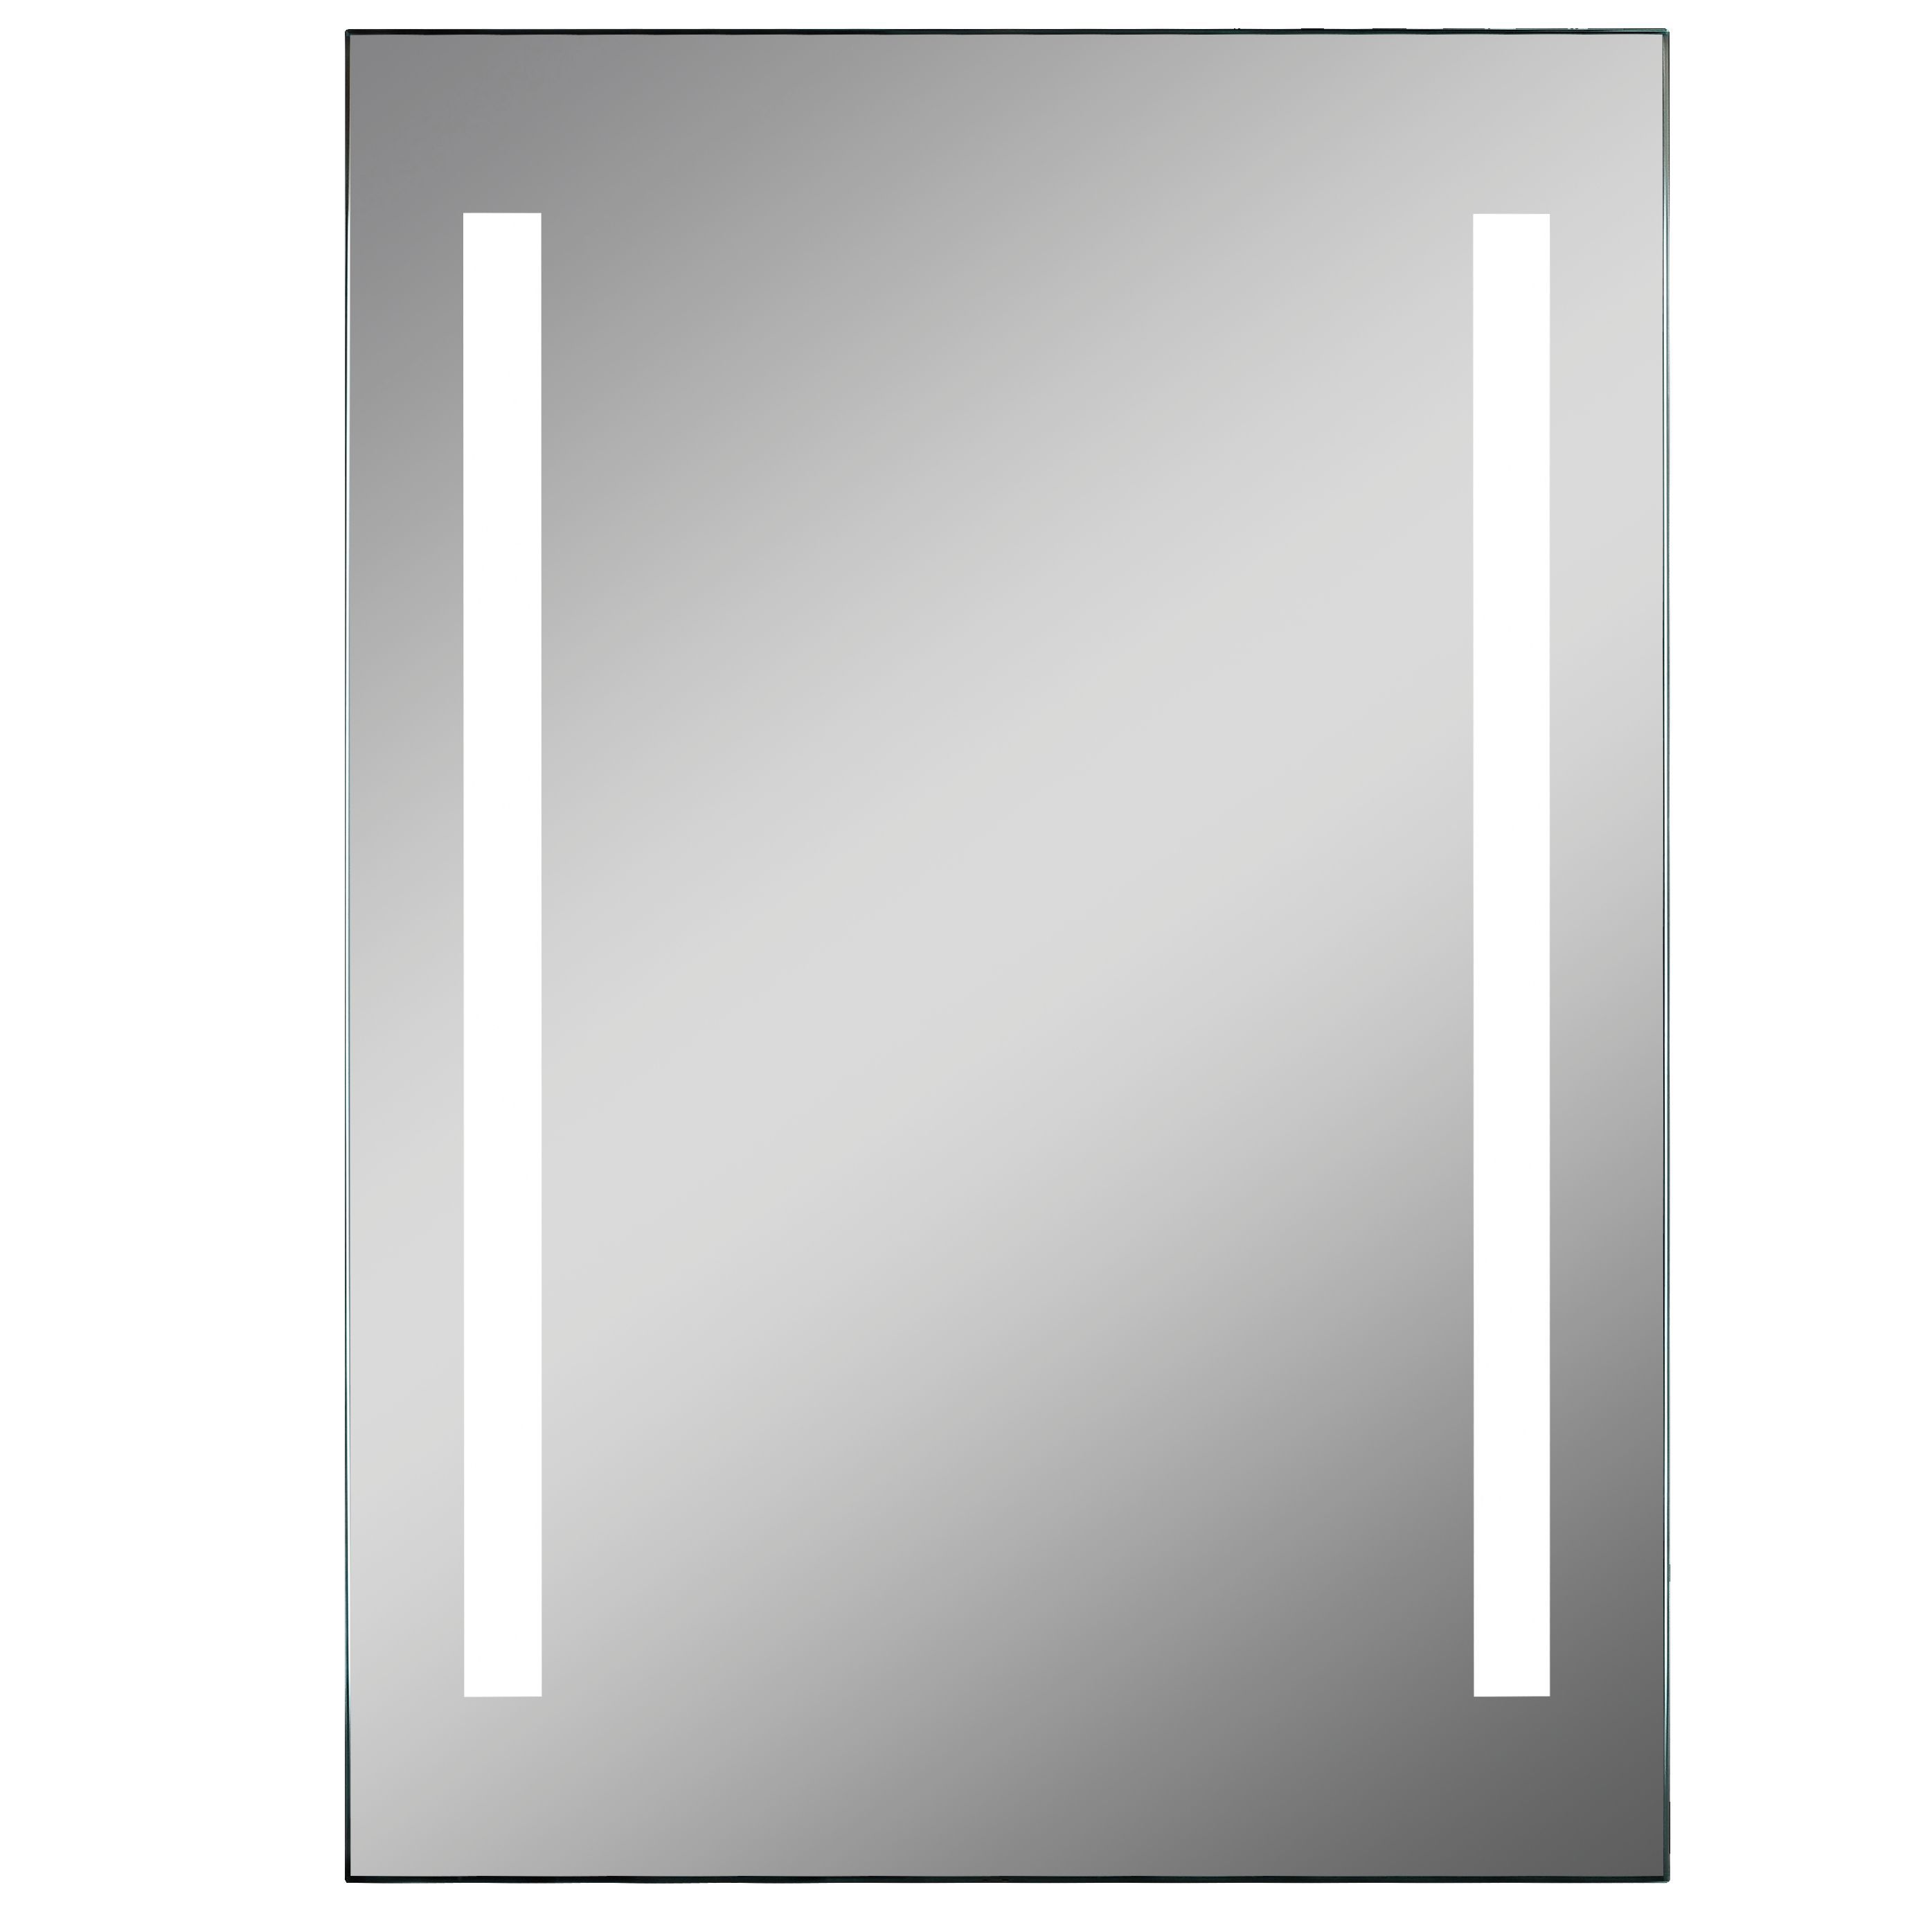 Lumino Pesanta Illuminated Bathroom Rectangular Mirror With Bluetooth Speakers (w)500mm (h)700mm